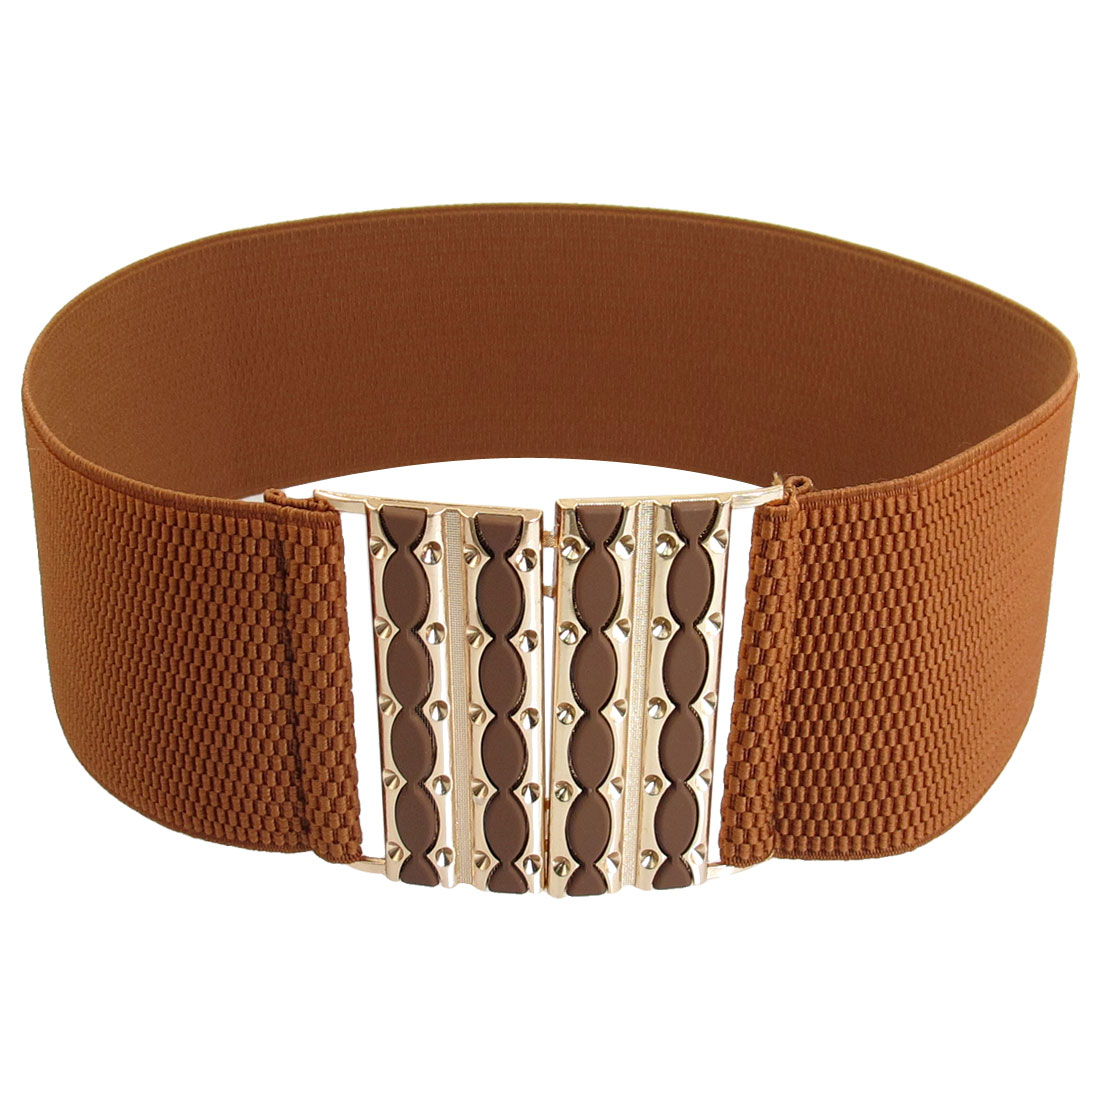 Woman Hook Buckle Closure Stretched Waist Belt Waistband Corset Band Cinch Brown